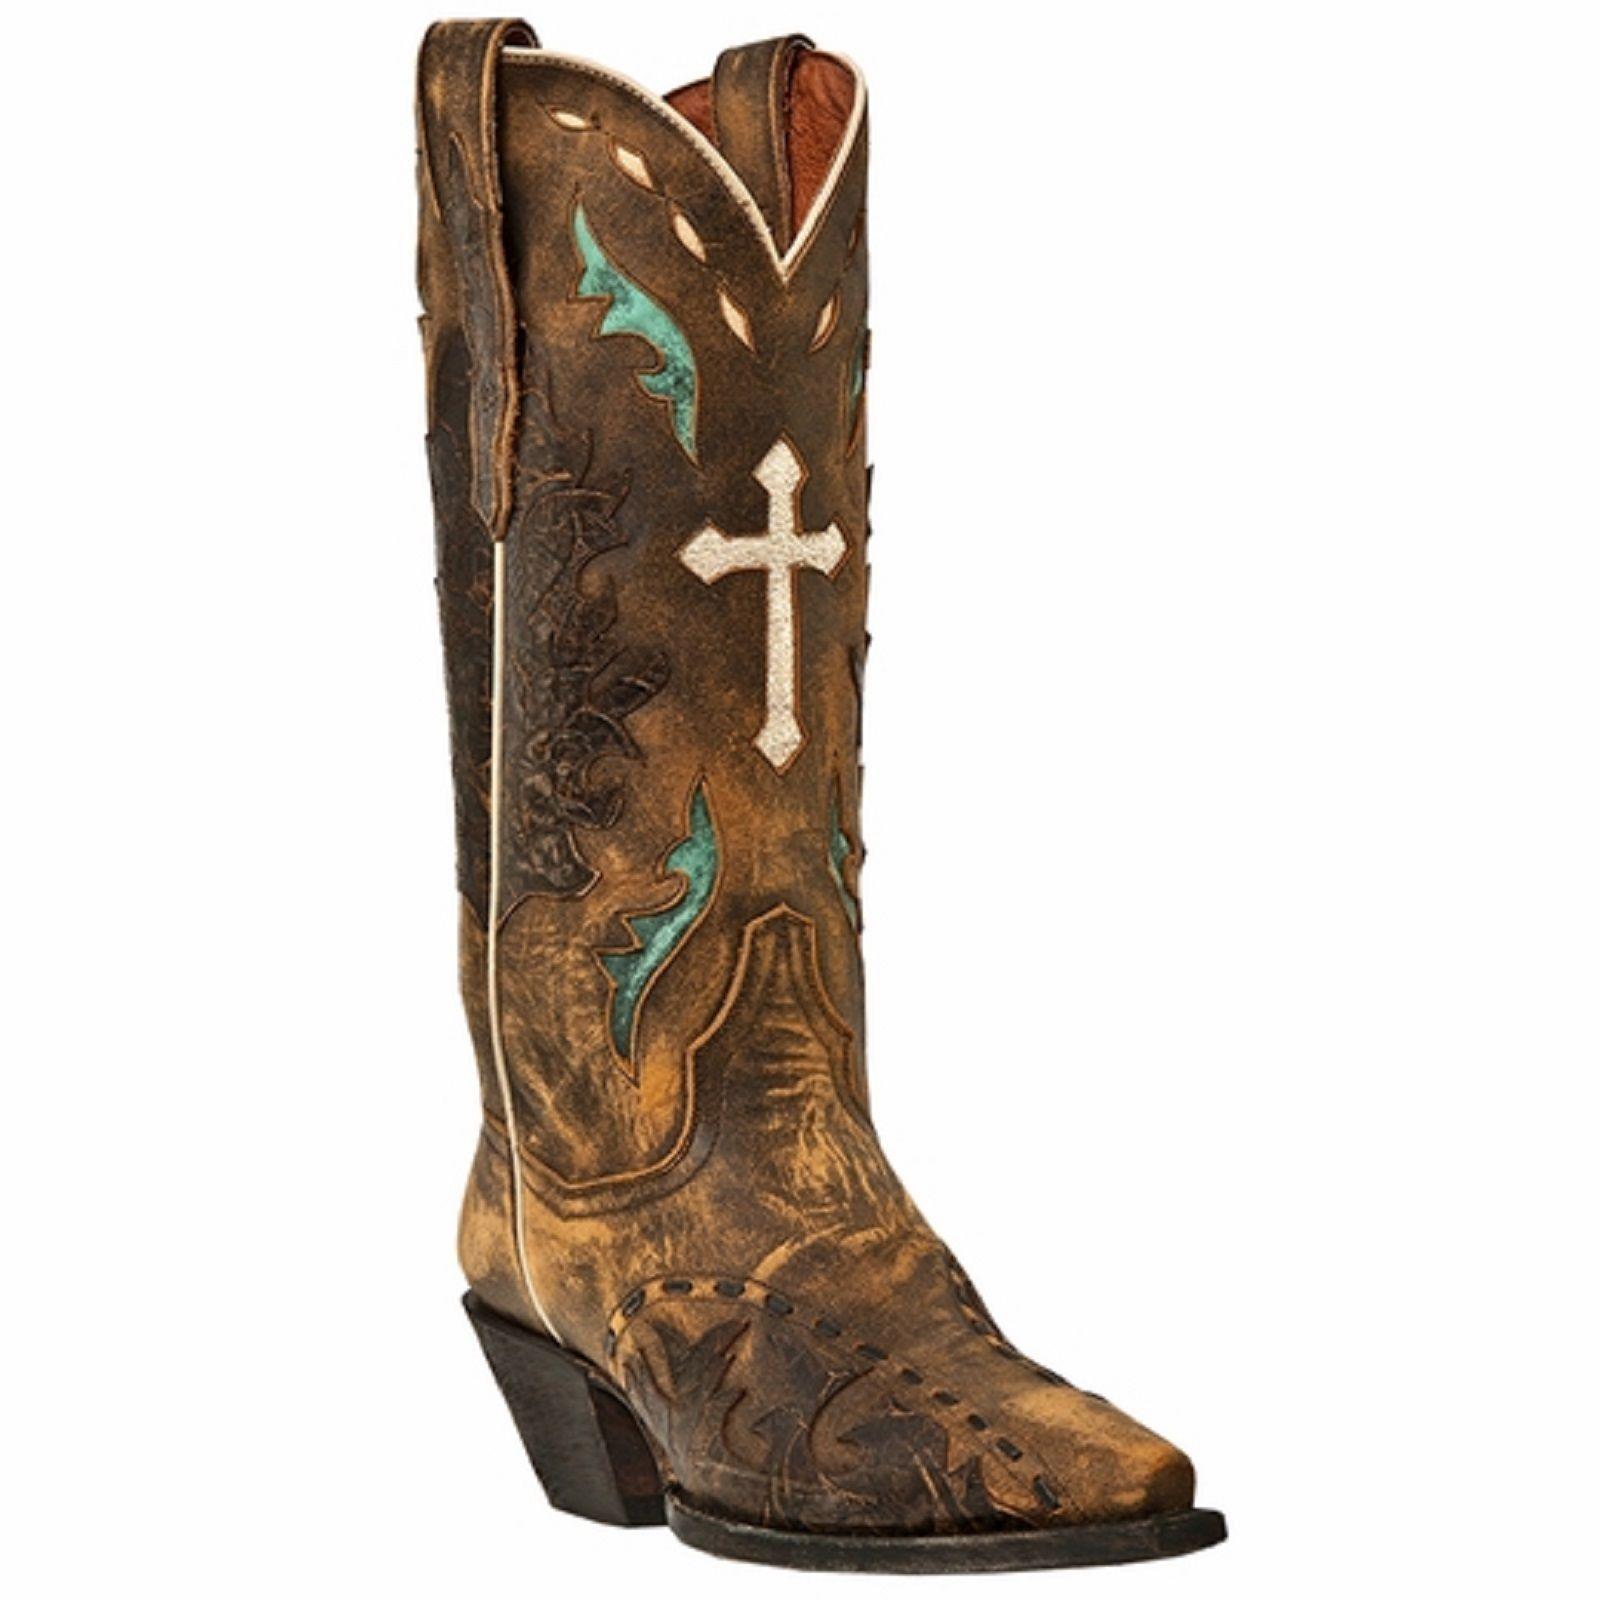 Dan Post DP3621 Women's Tan Anthem Western Boots - $262.99